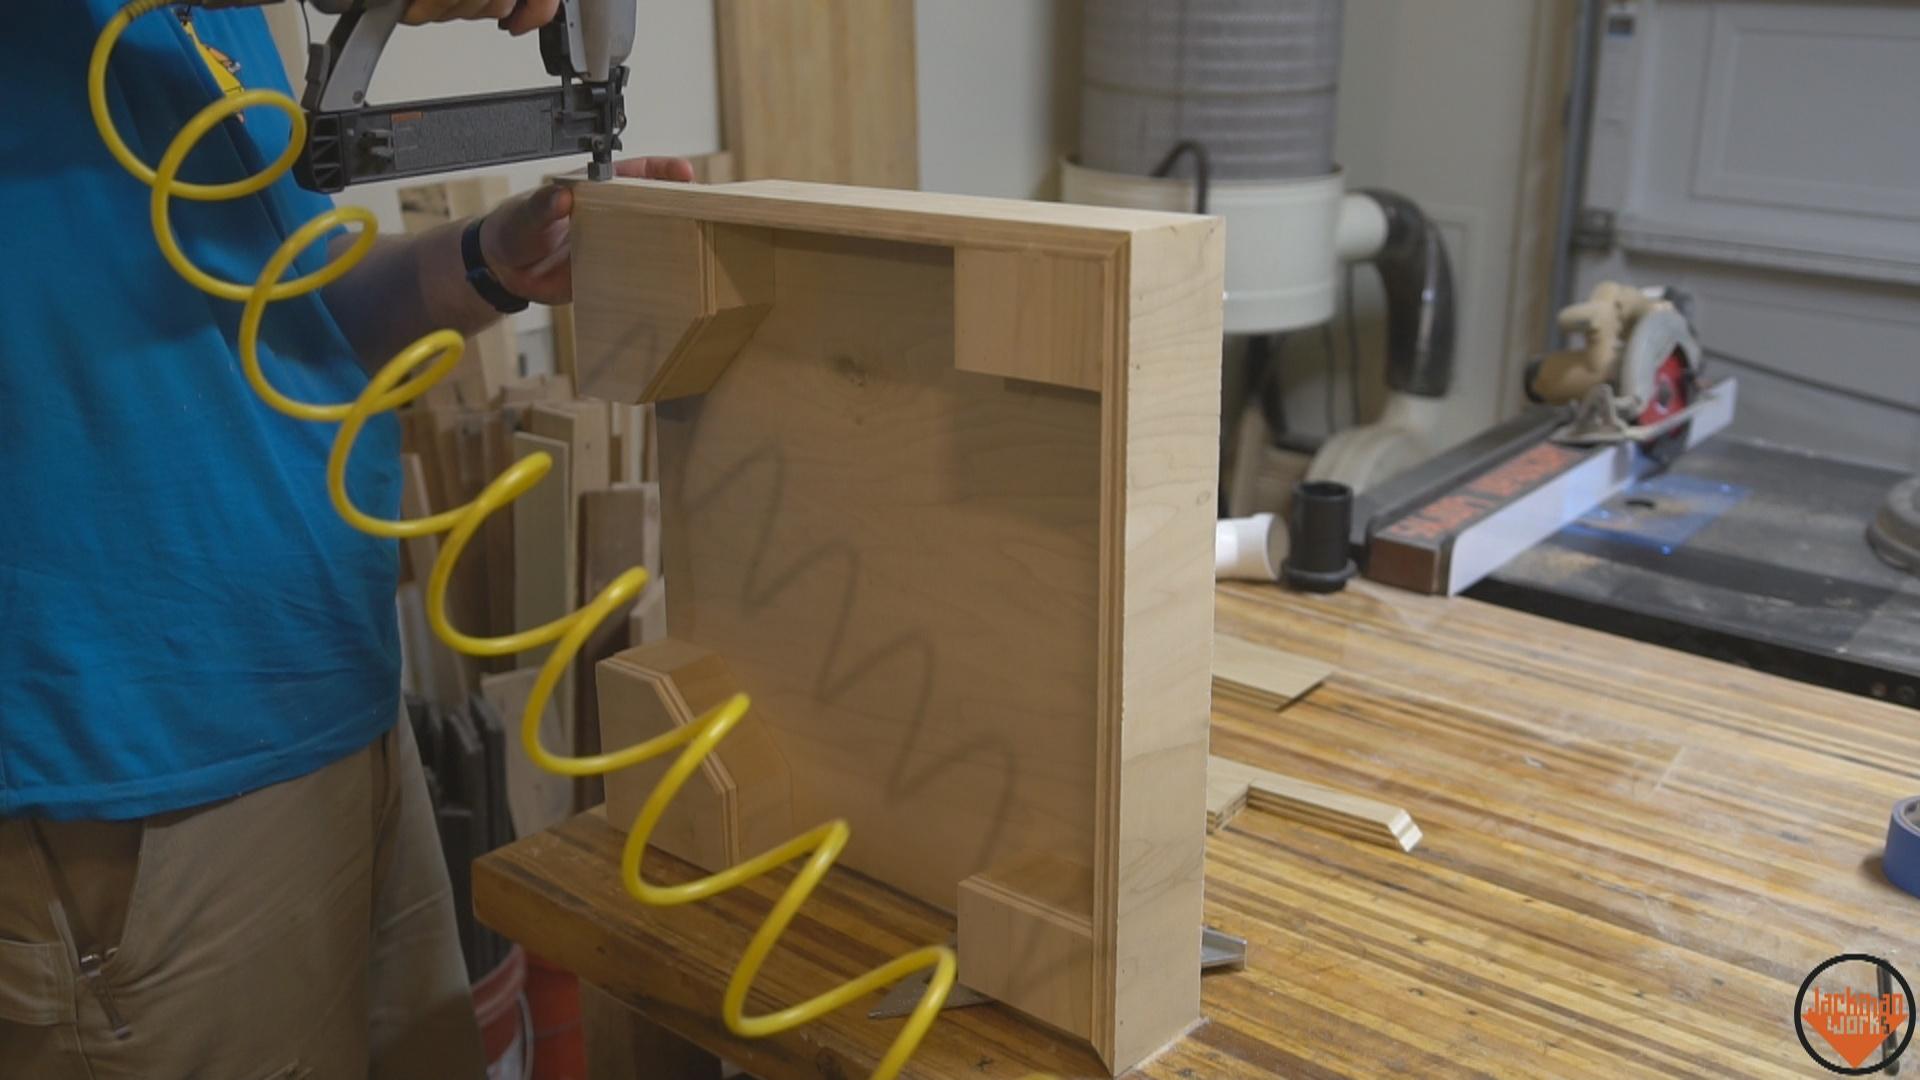 Space Saving Shop-Vac Dust Collector Cart 10 – Jackman Works